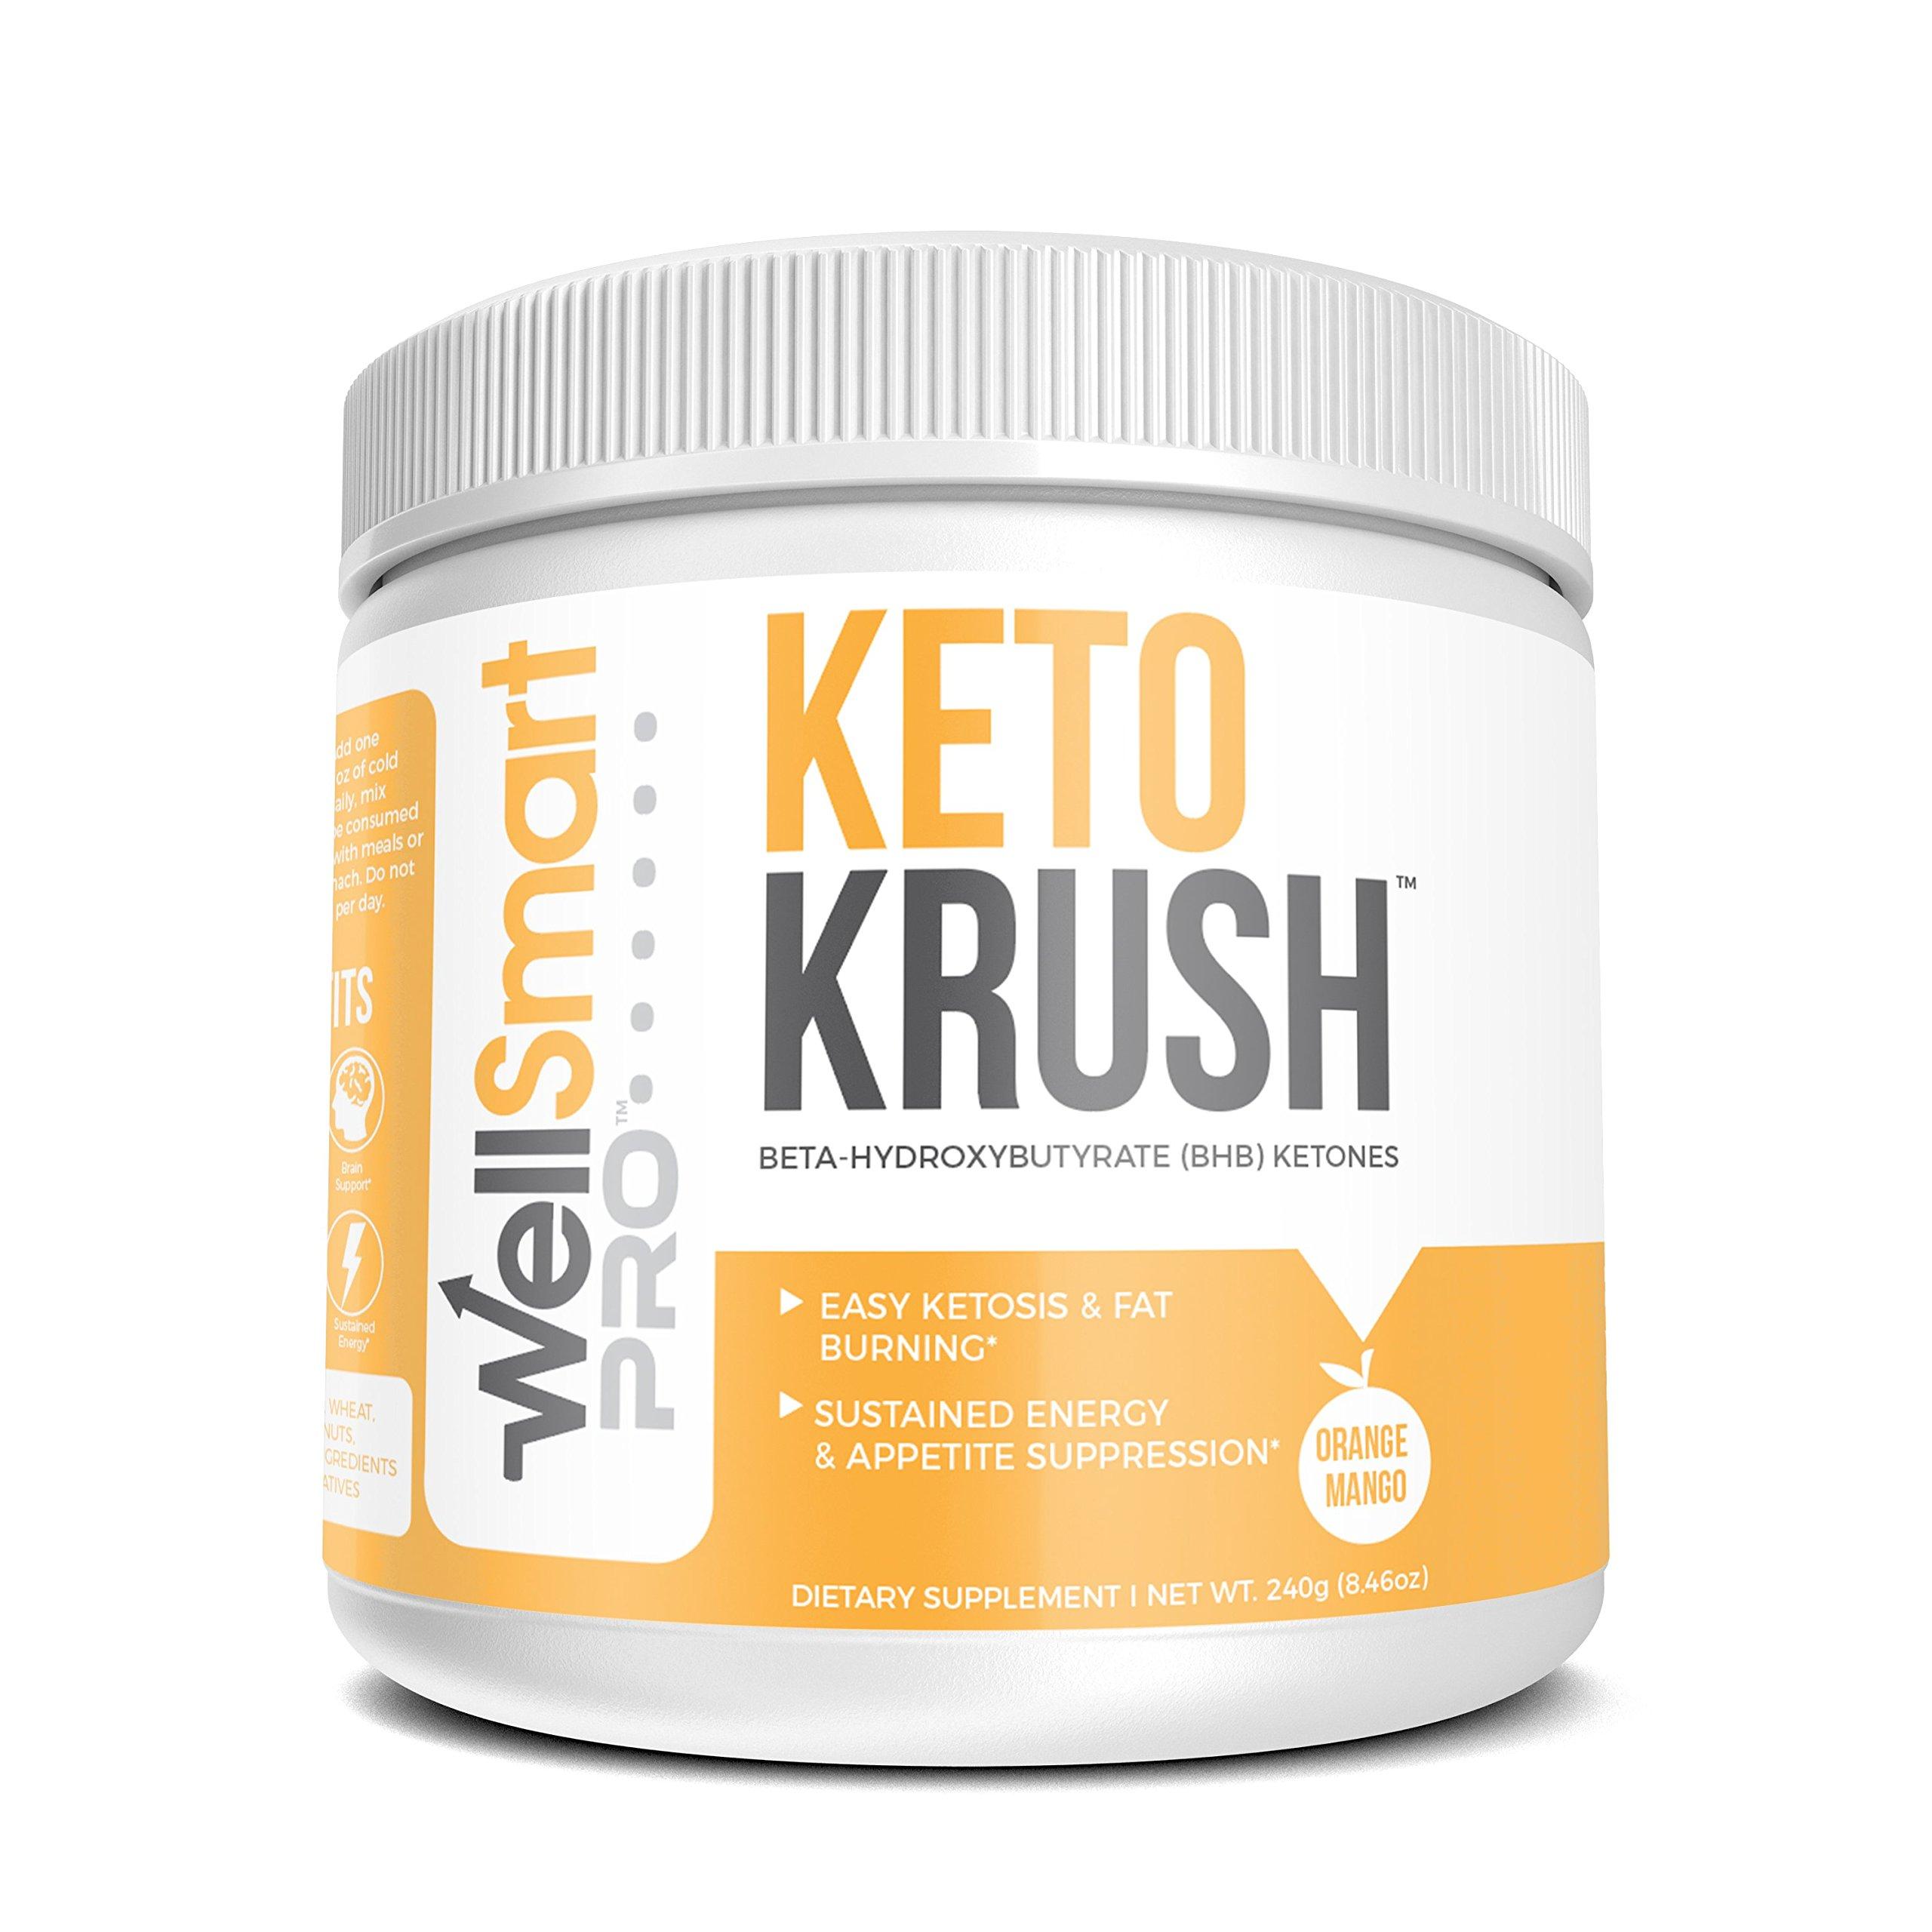 KETO KRUSH Keto Orange Mango Powder Supplement – Fast, Easy Ketosis – Organic Beta Hydroxybutyrate (BHB) Ketones – Ketogenic Diet Support, Energy Booster, Appetite Suppressant & Fat Burner